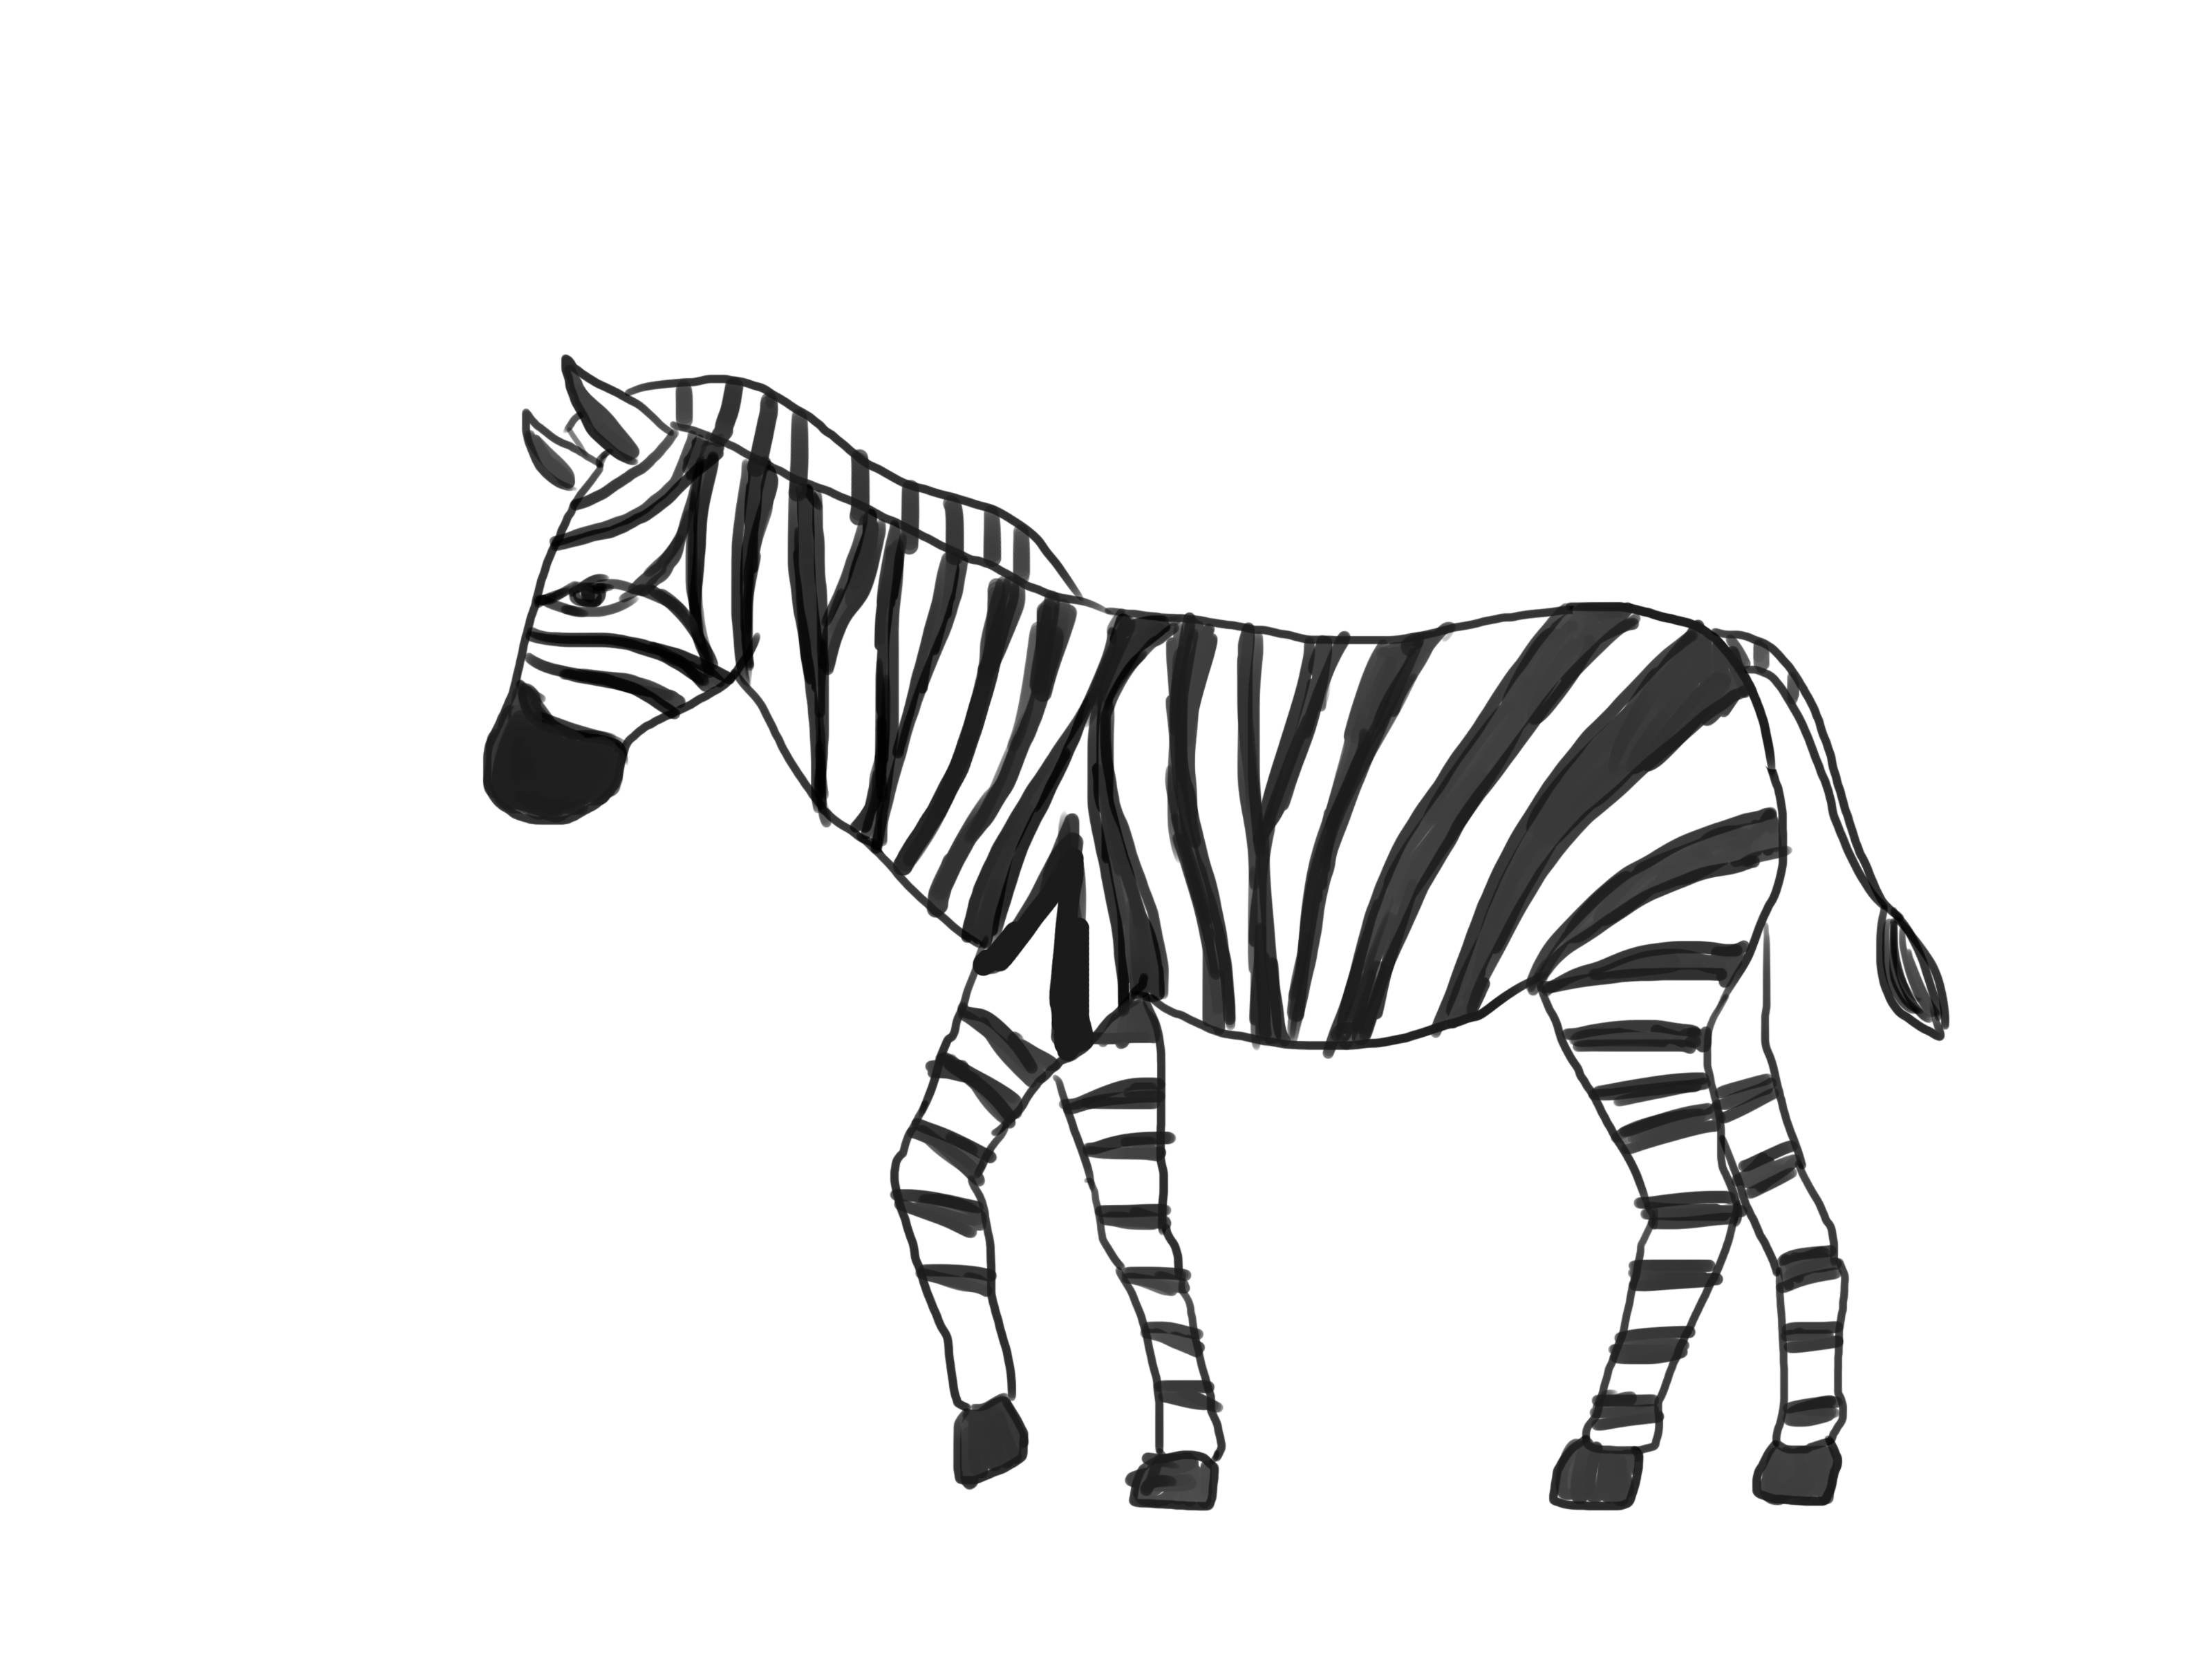 3200x2400 Draw A Zebra Art Lessons And Illustrations